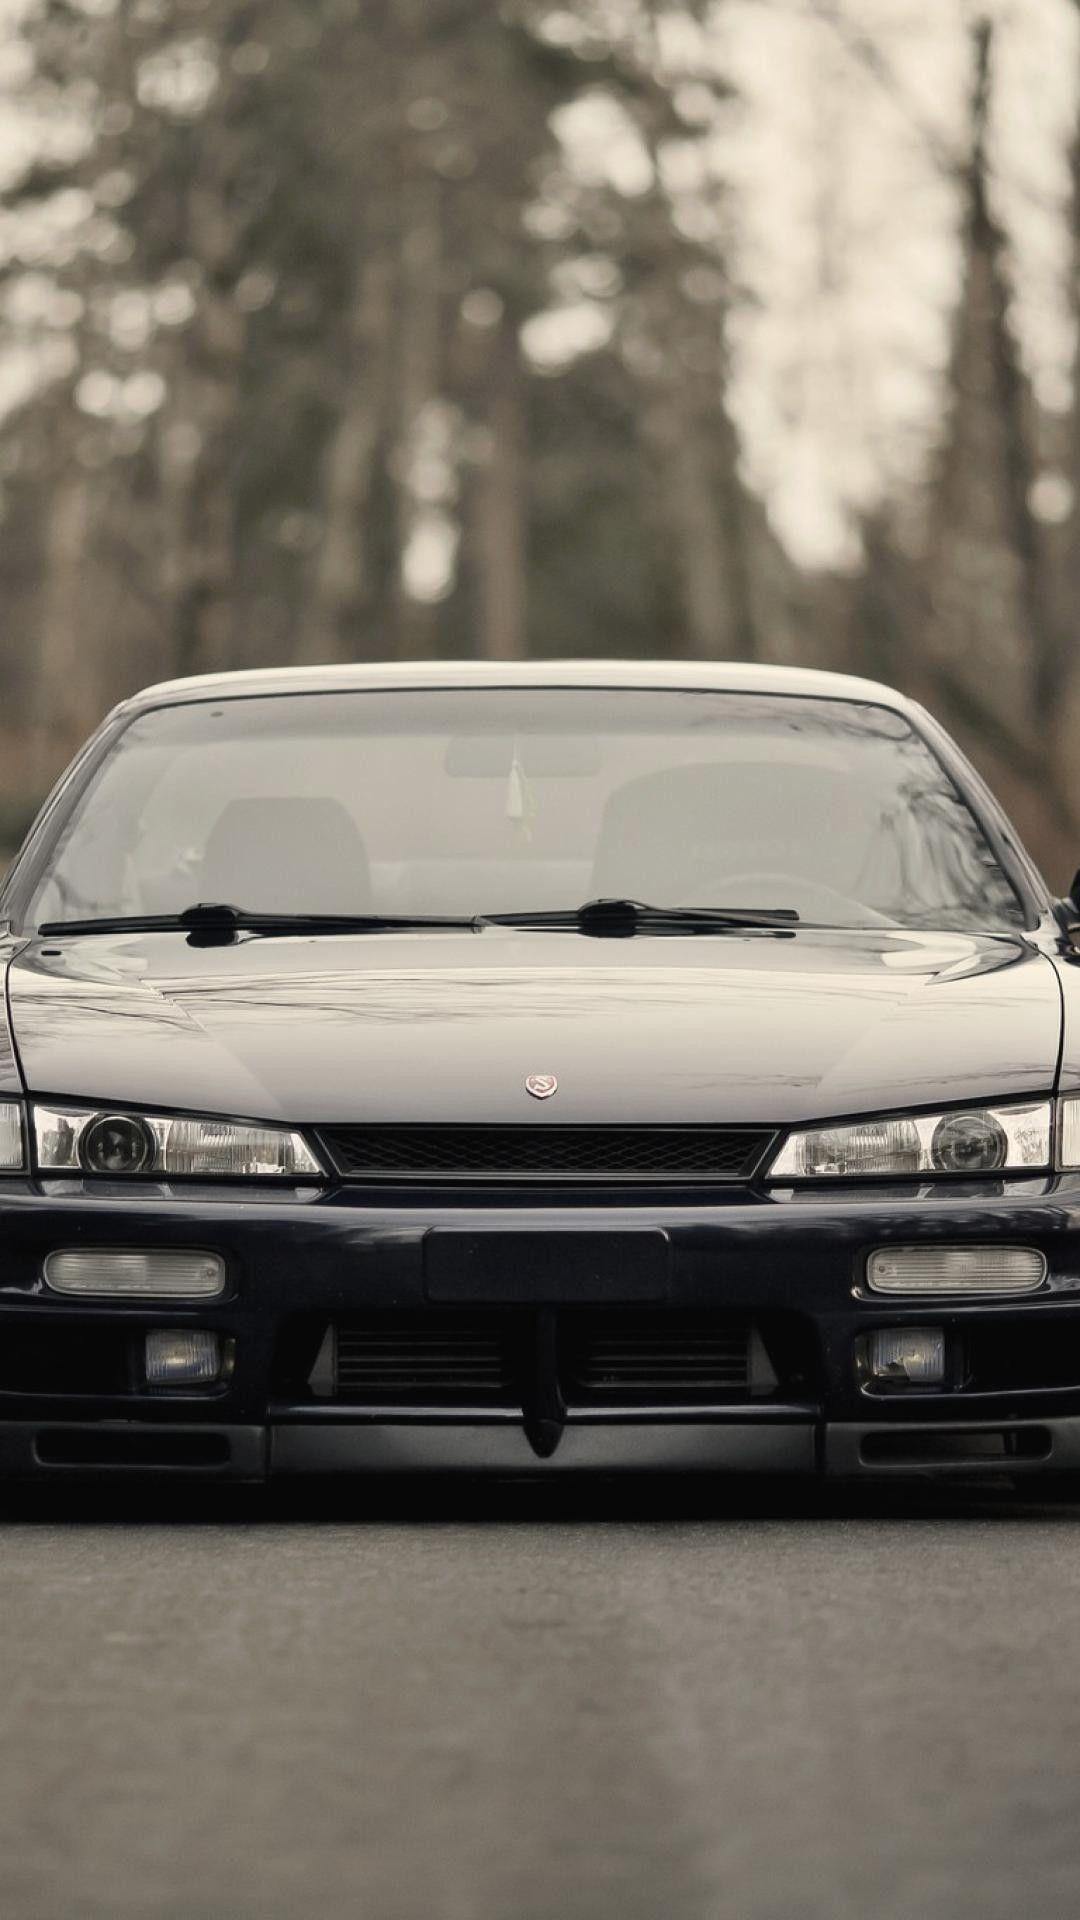 Drift Car Iphone Wallpapers Top Free Drift Car Iphone